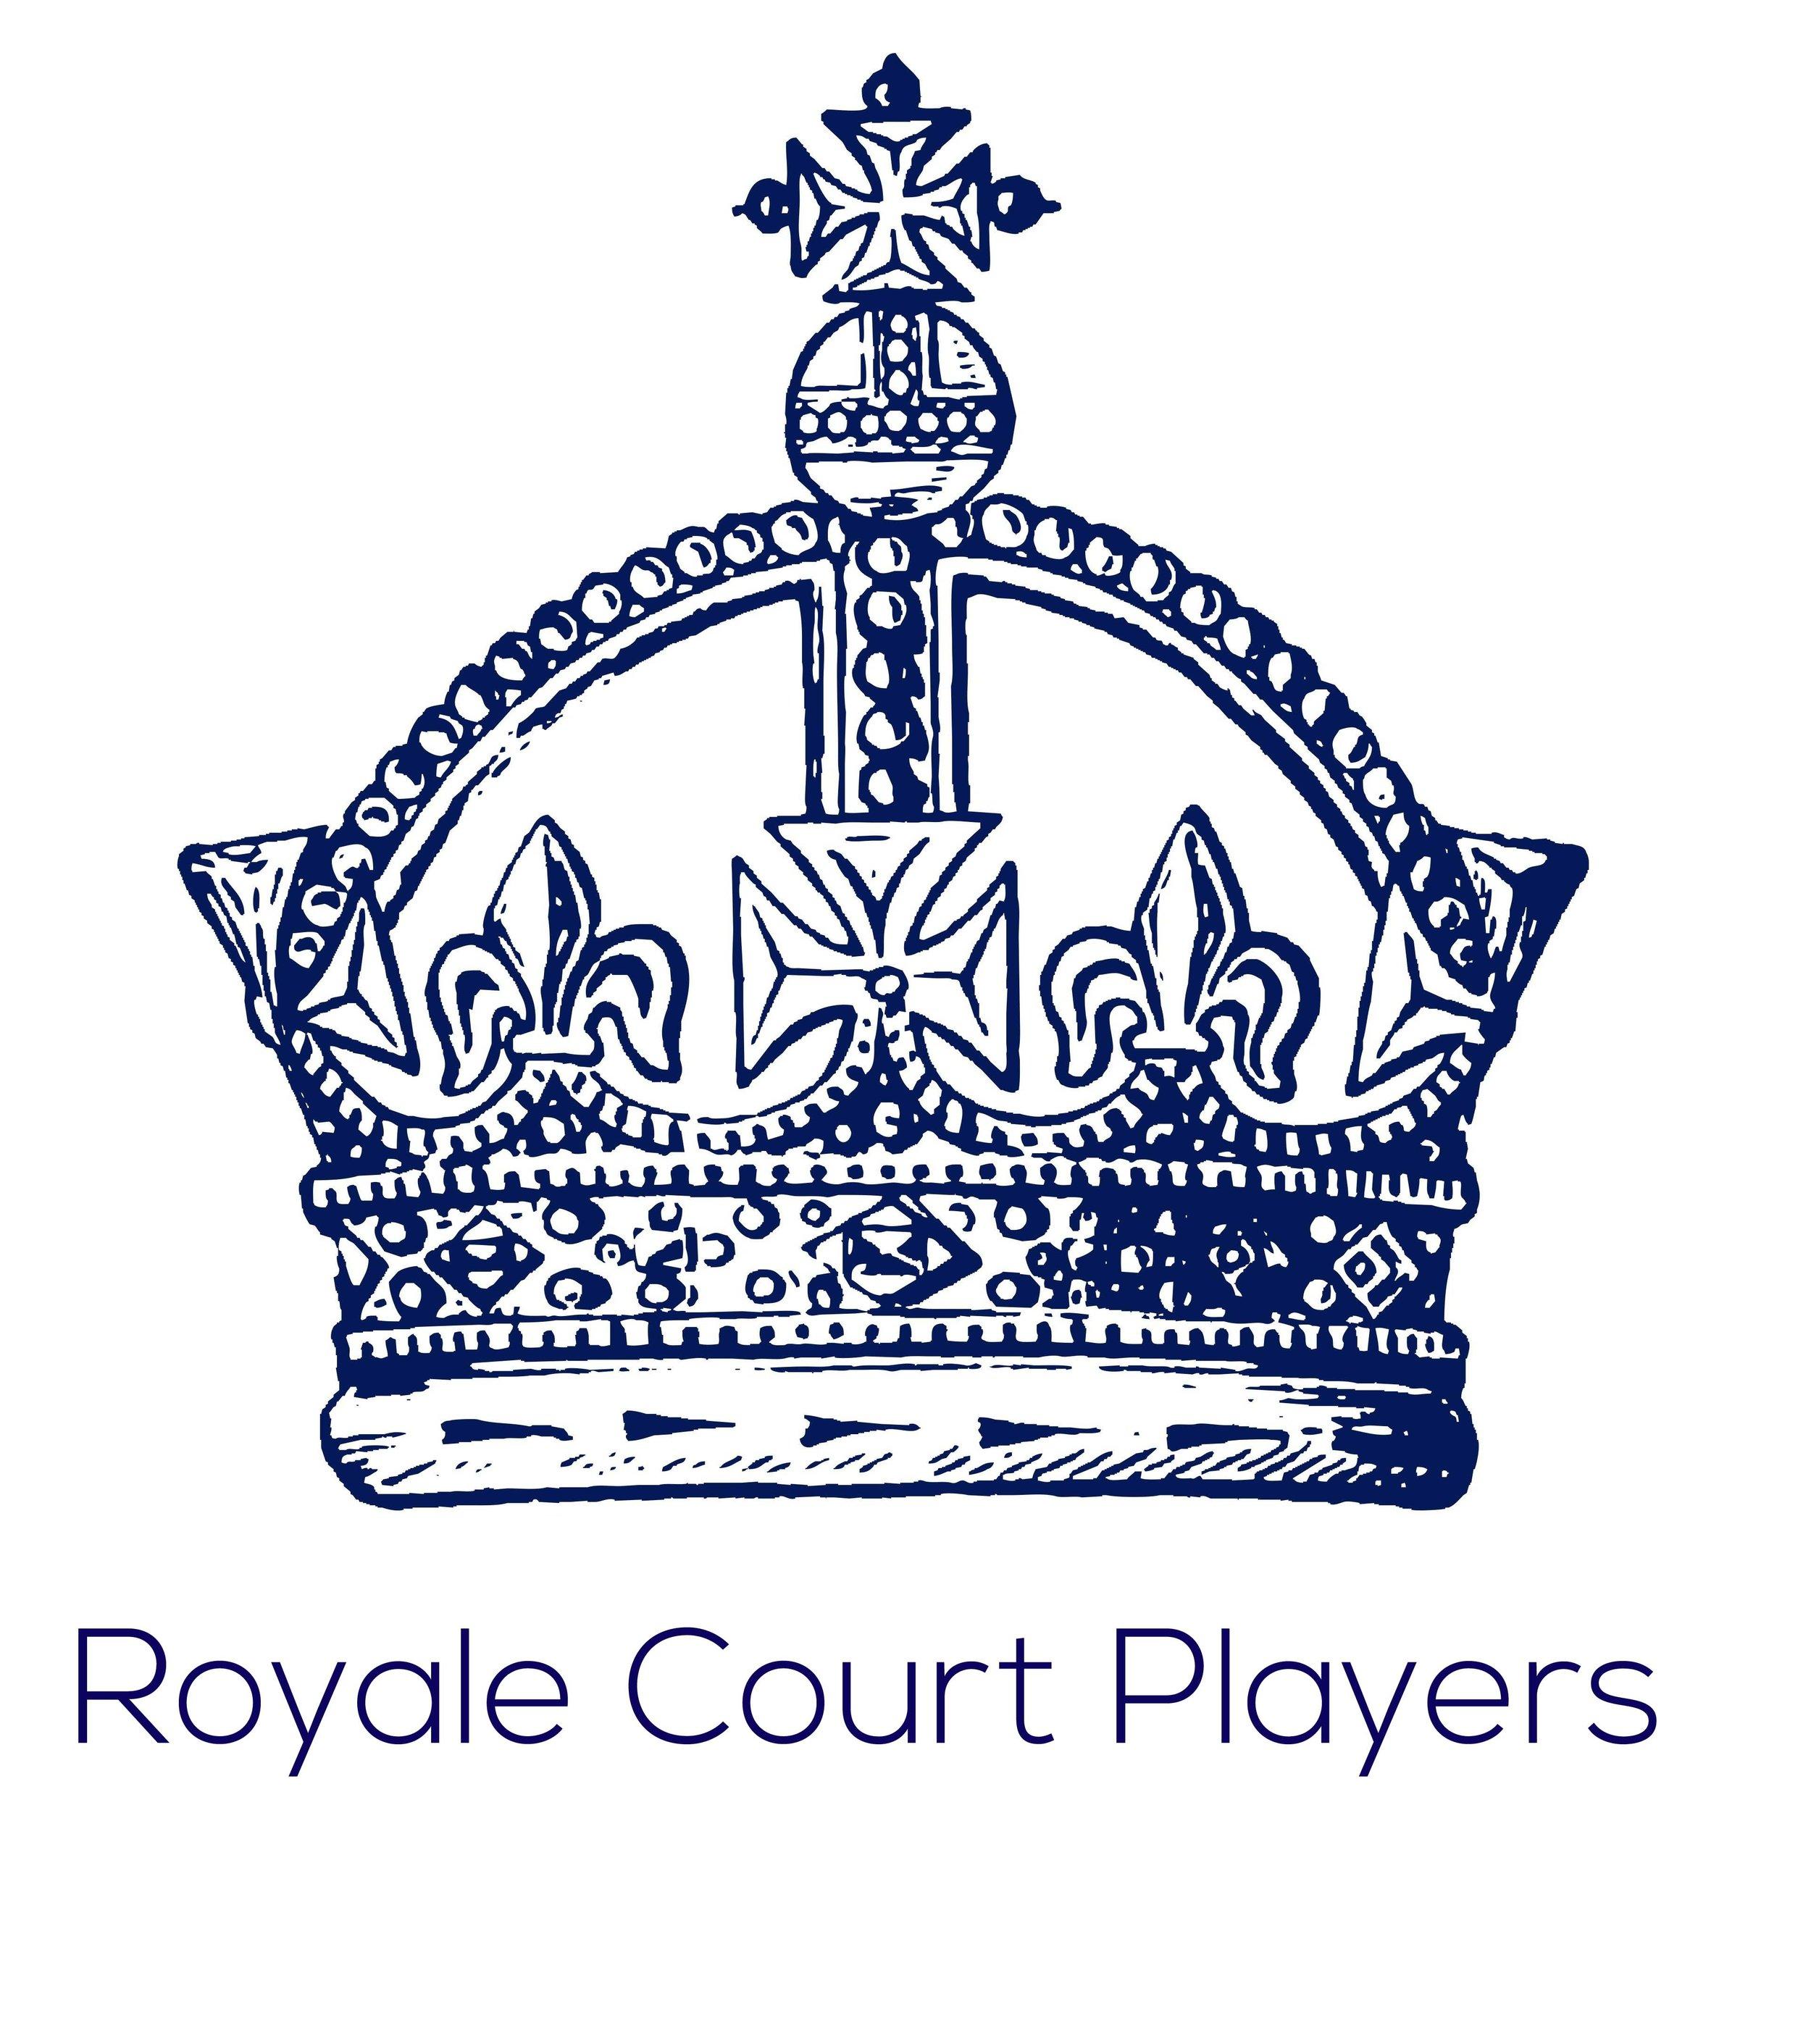 Royale_Court_Player.jpg